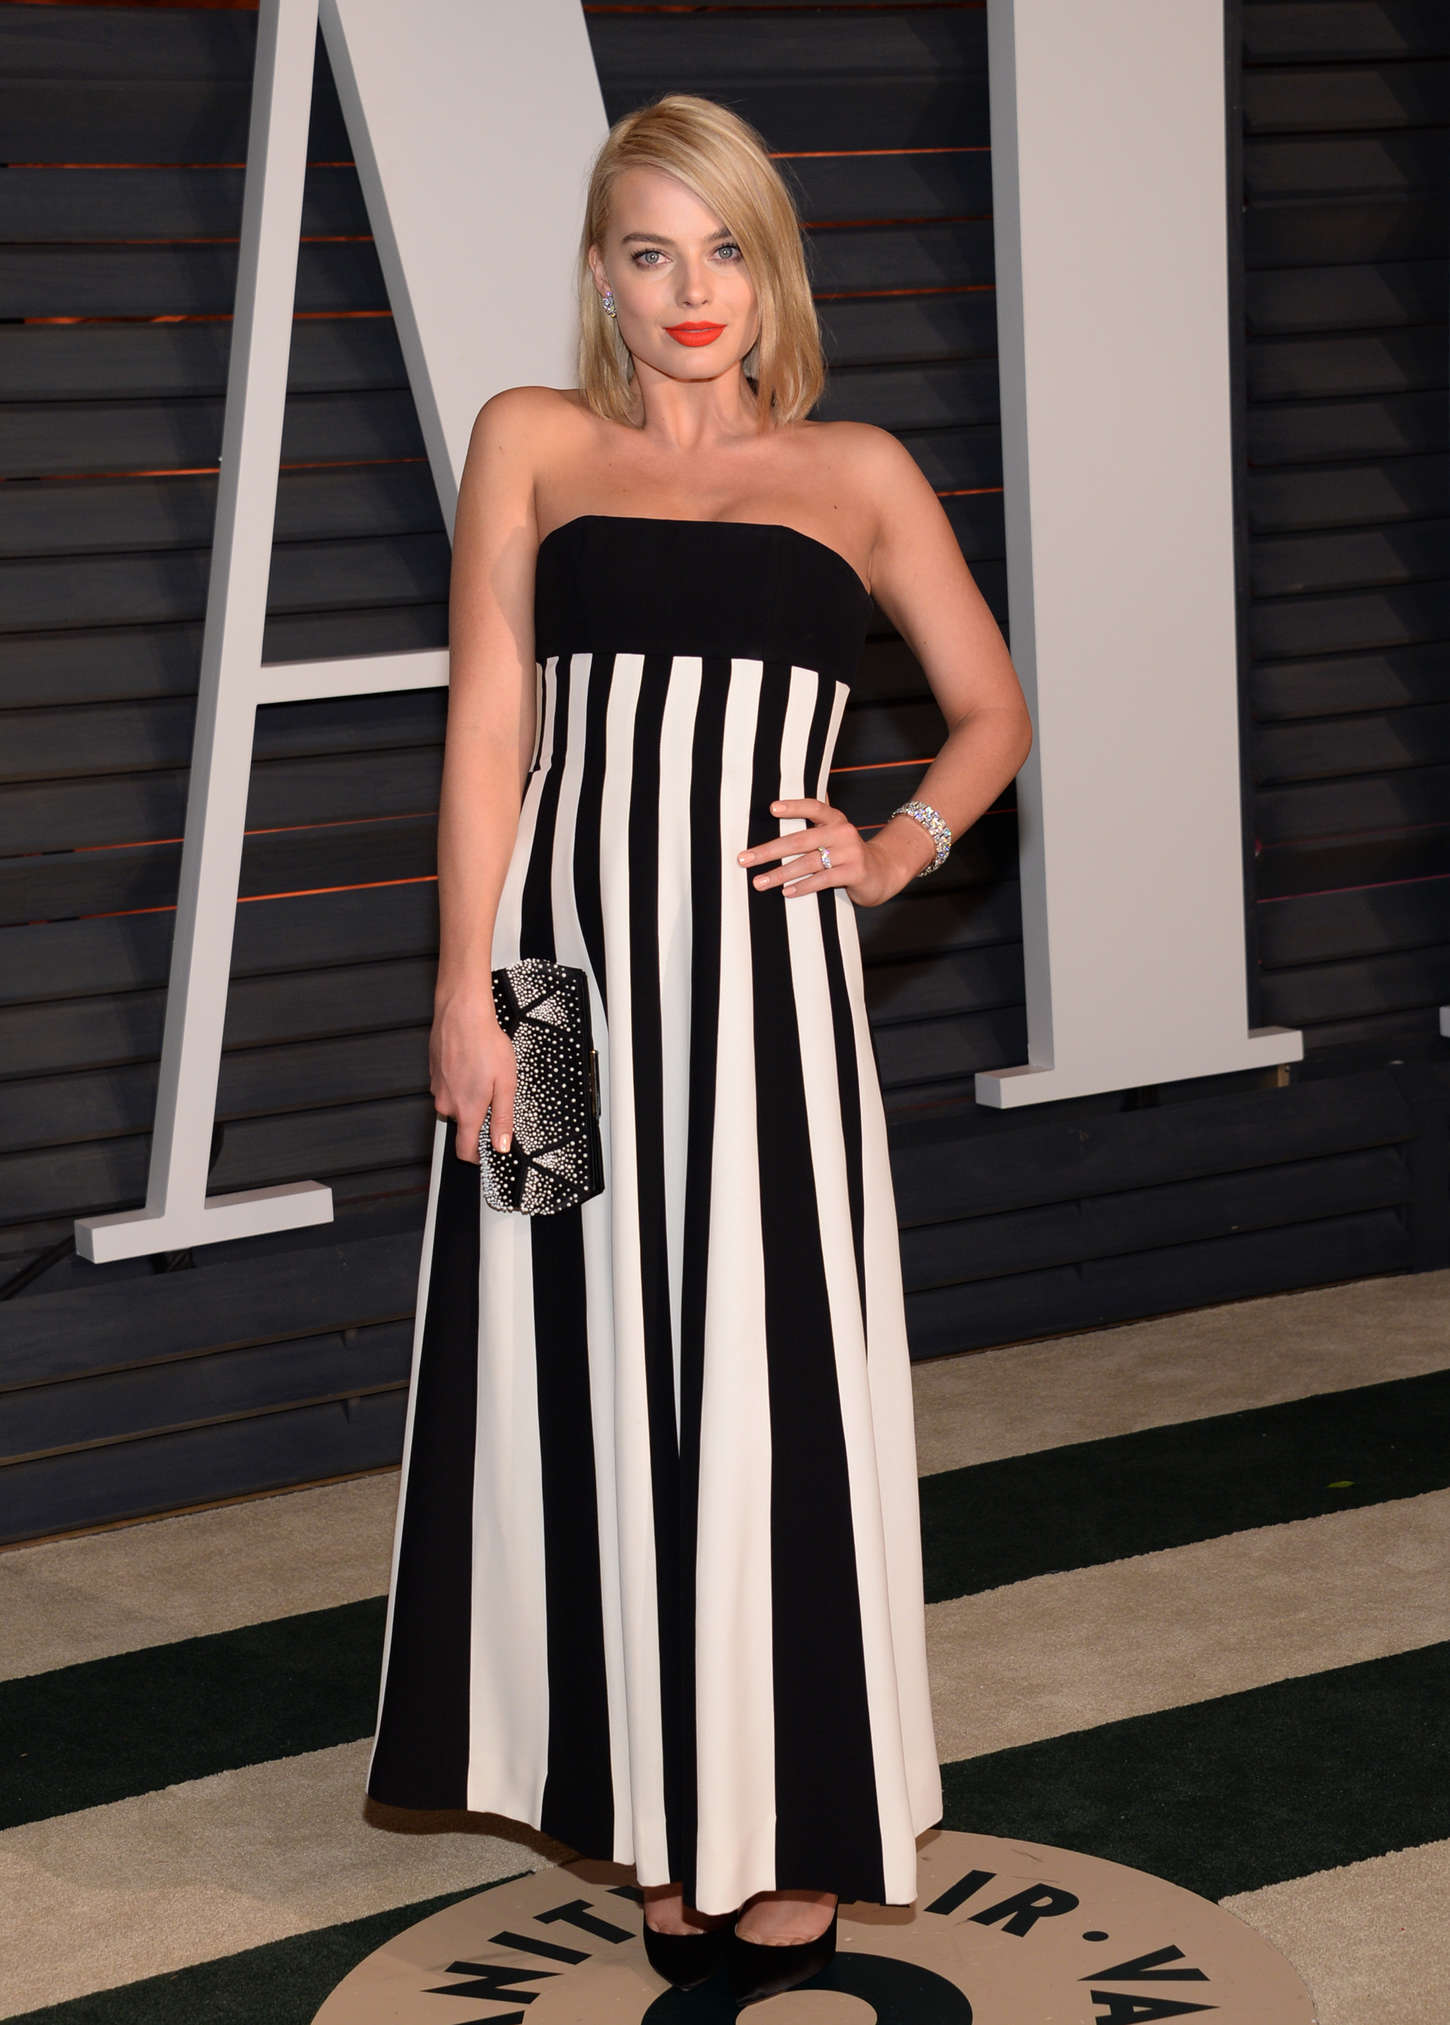 Margot Robbie - 2015 Vanity Fair Oscar Party in Hollywood